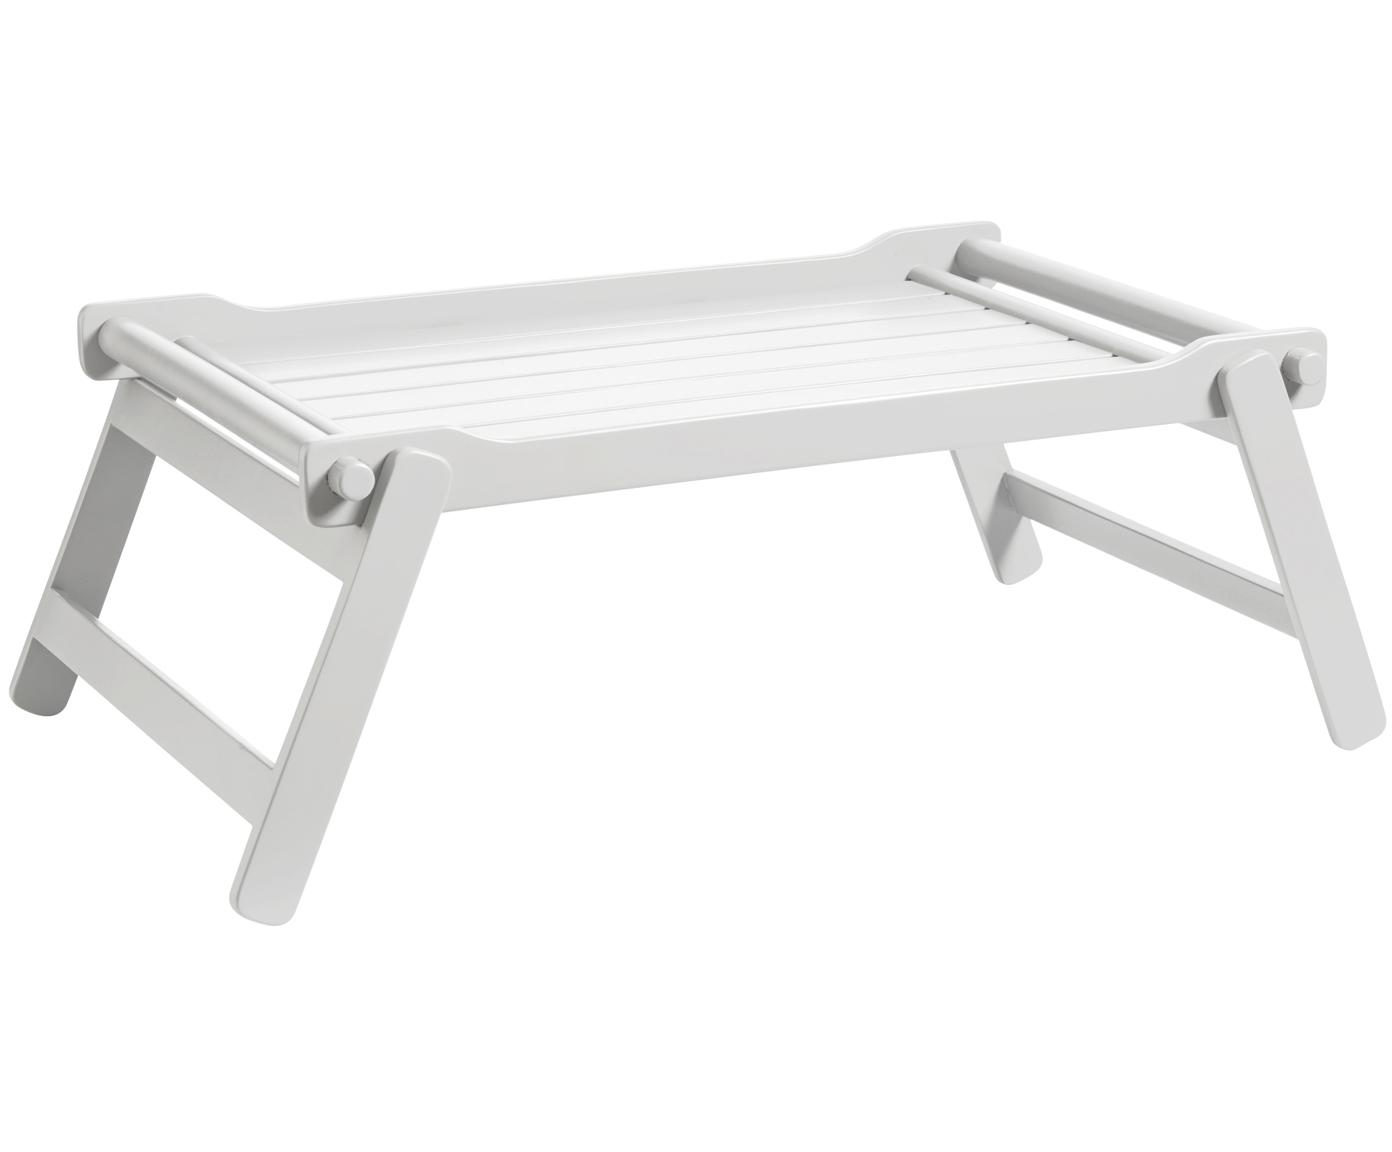 Klappbares Holz-Serviertablett Bed, Mahagoniholz, Polyurethan lackiert, Weiss , B 58 x T 36 cm